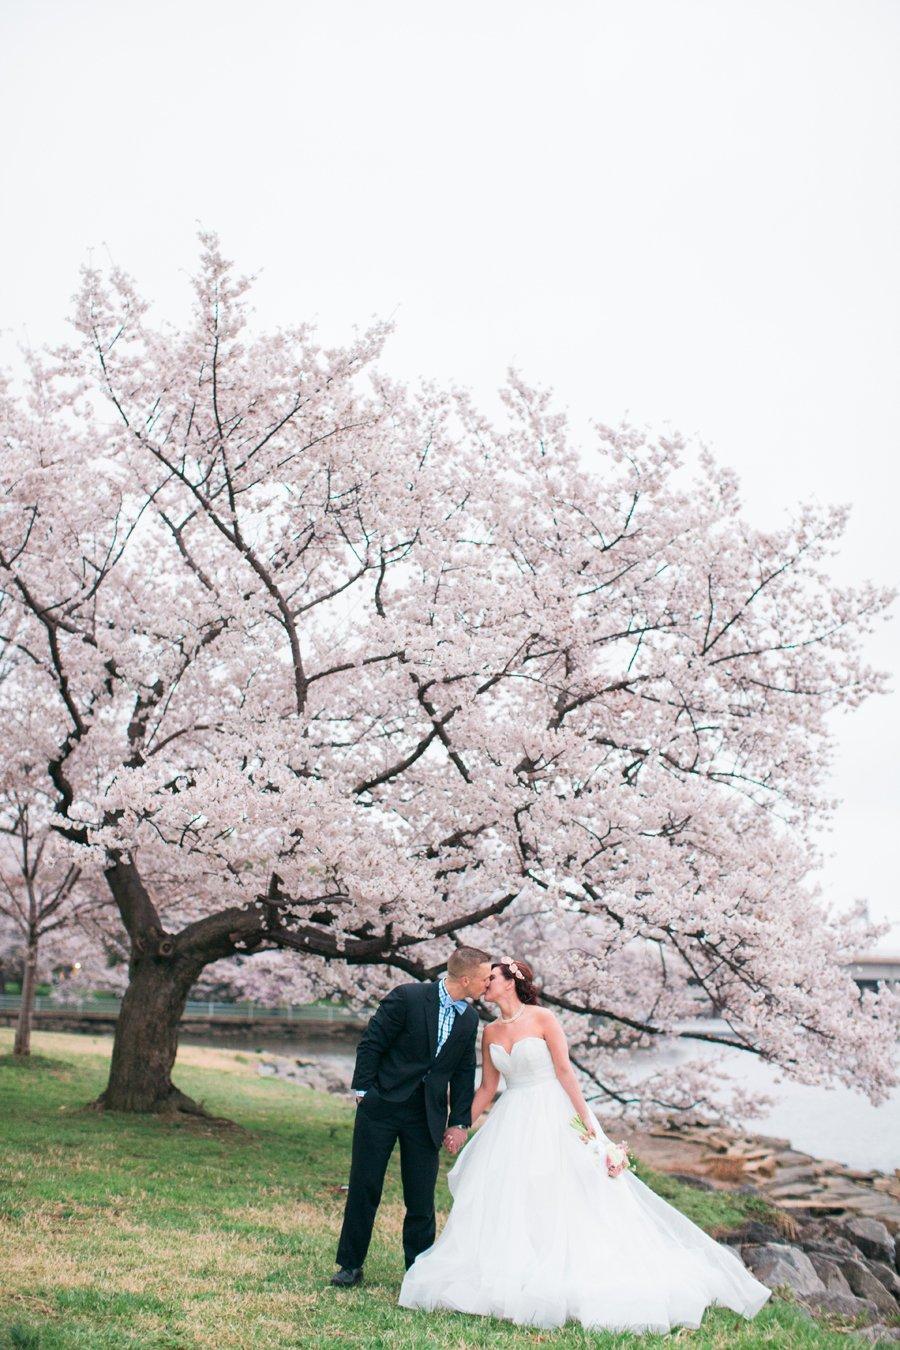 20 Amazing Places For Wedding Photos In Washington Dc